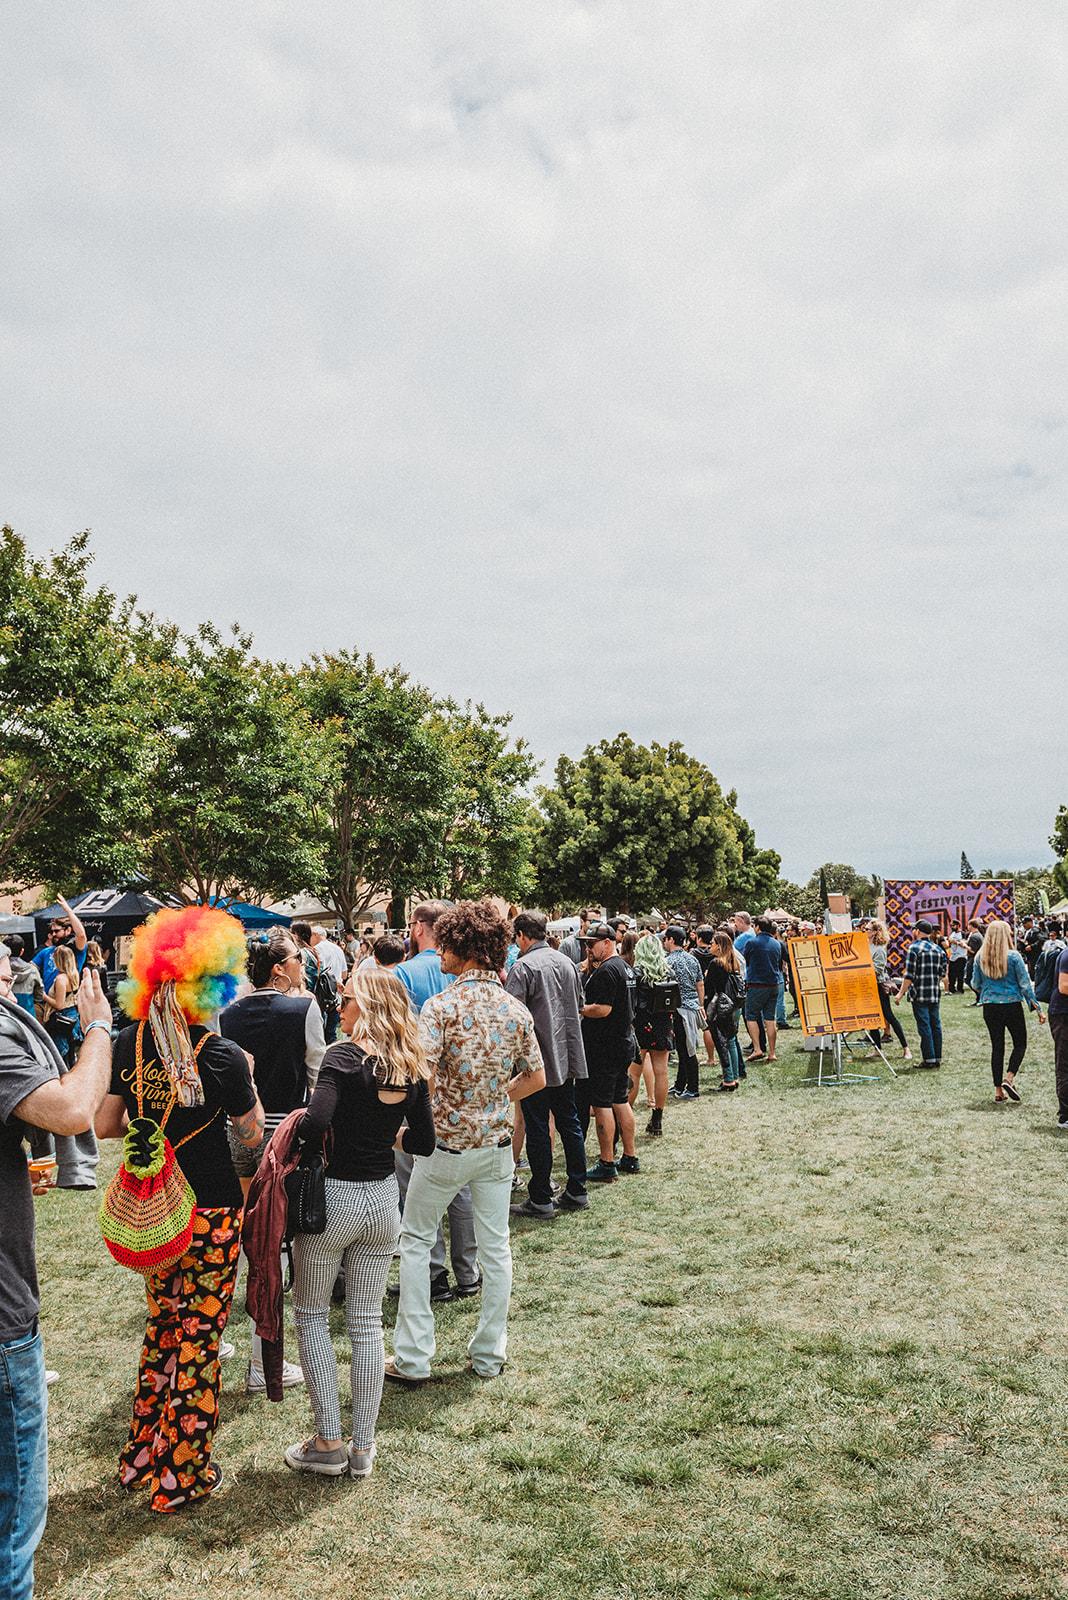 FestivalofFunk-39.jpg_websize.jpg